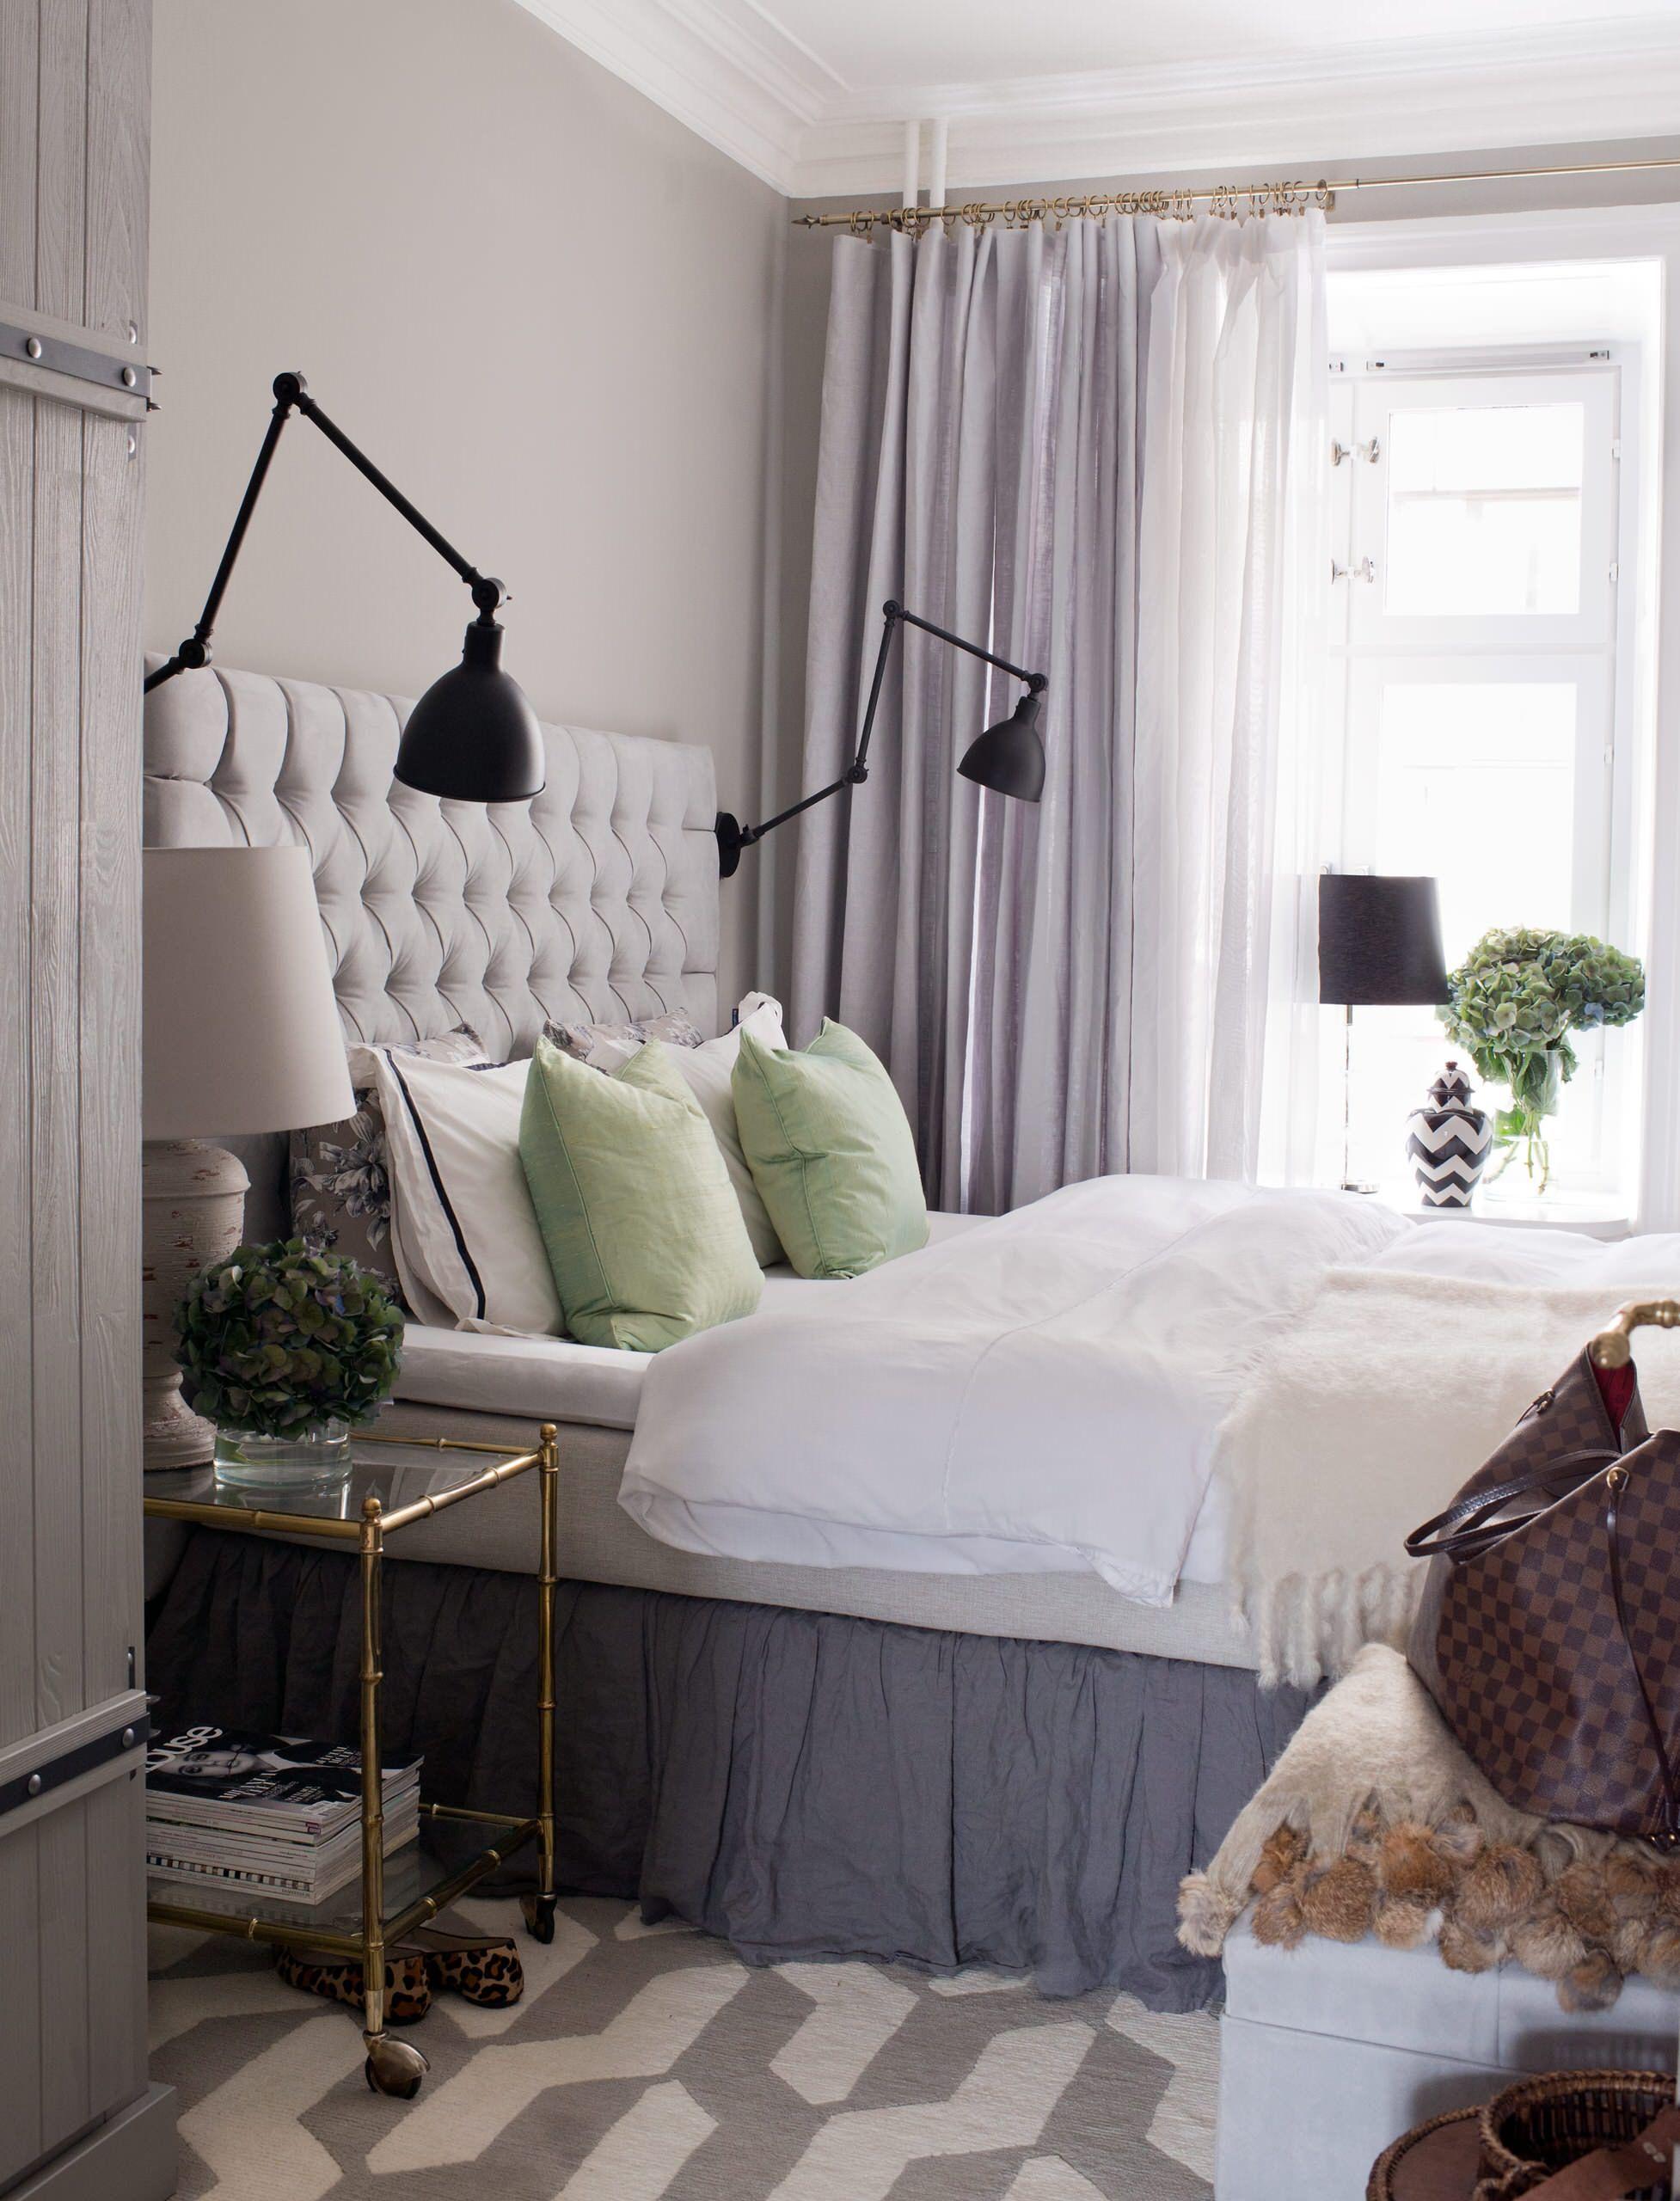 5 Ideas For Your Next Bedroom - Home Awakening  Bedroom interior